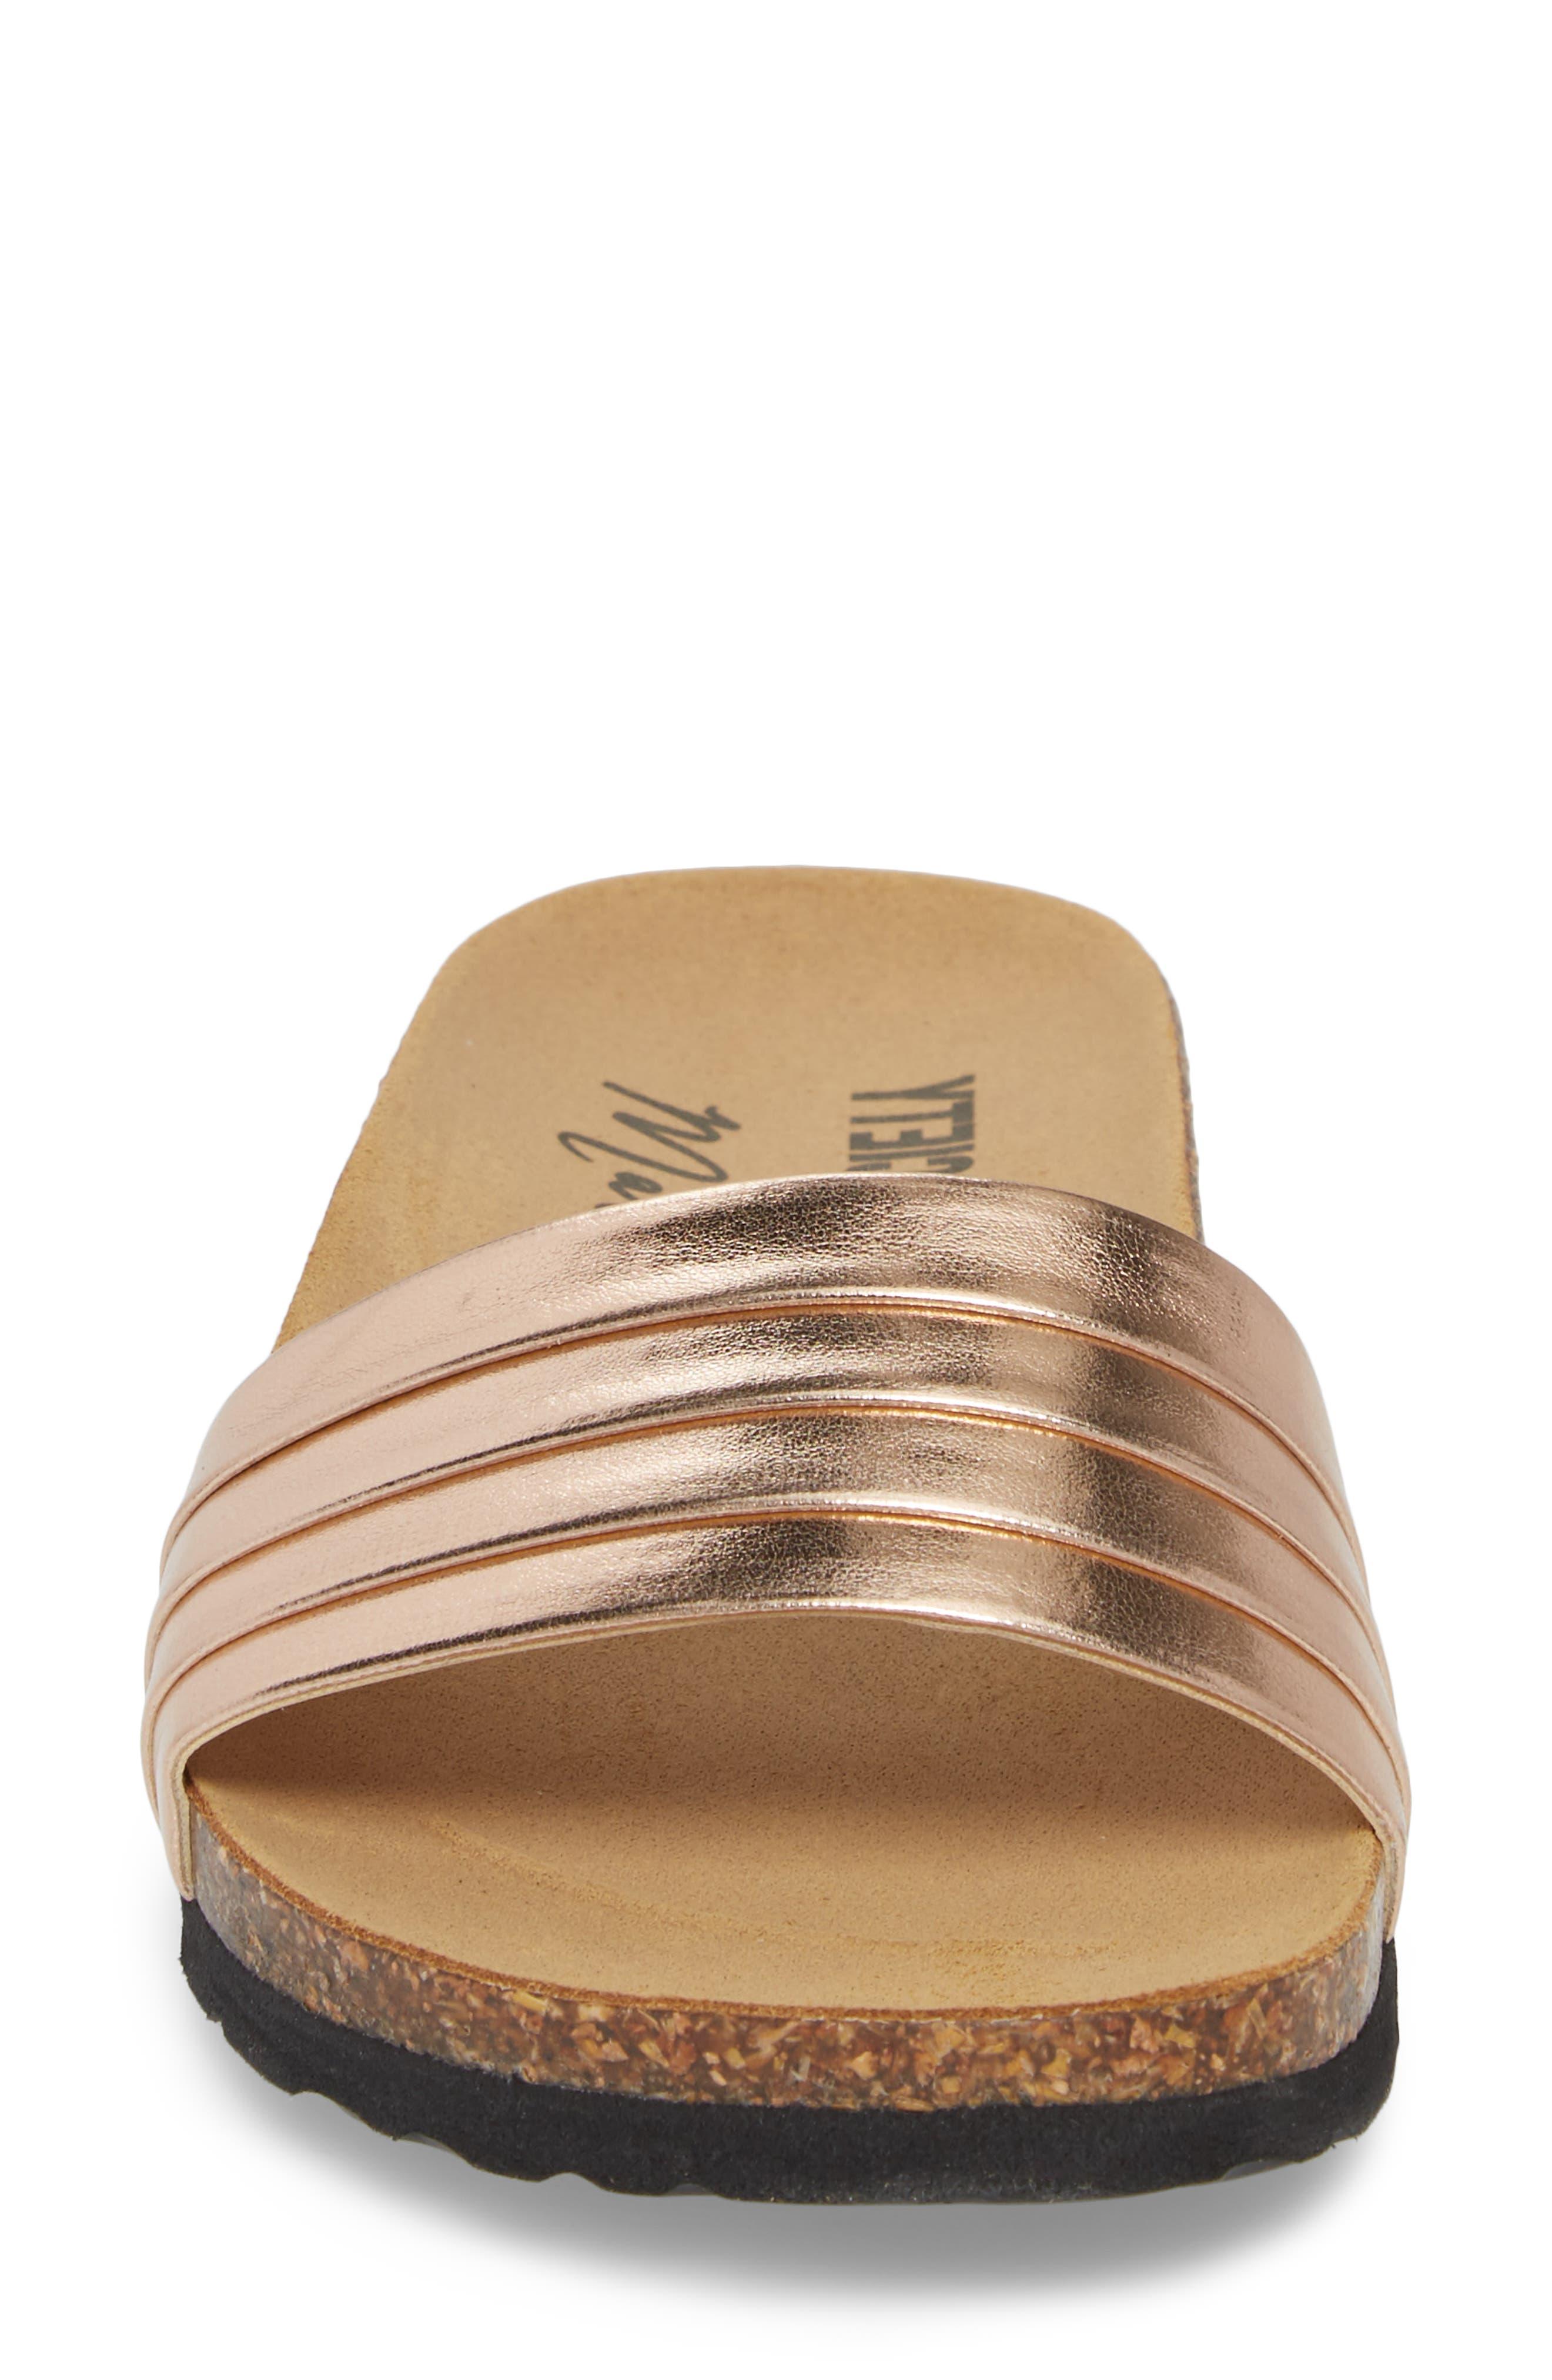 Santos Slide Sandal,                             Alternate thumbnail 4, color,                             Rose Gold Faux Leather